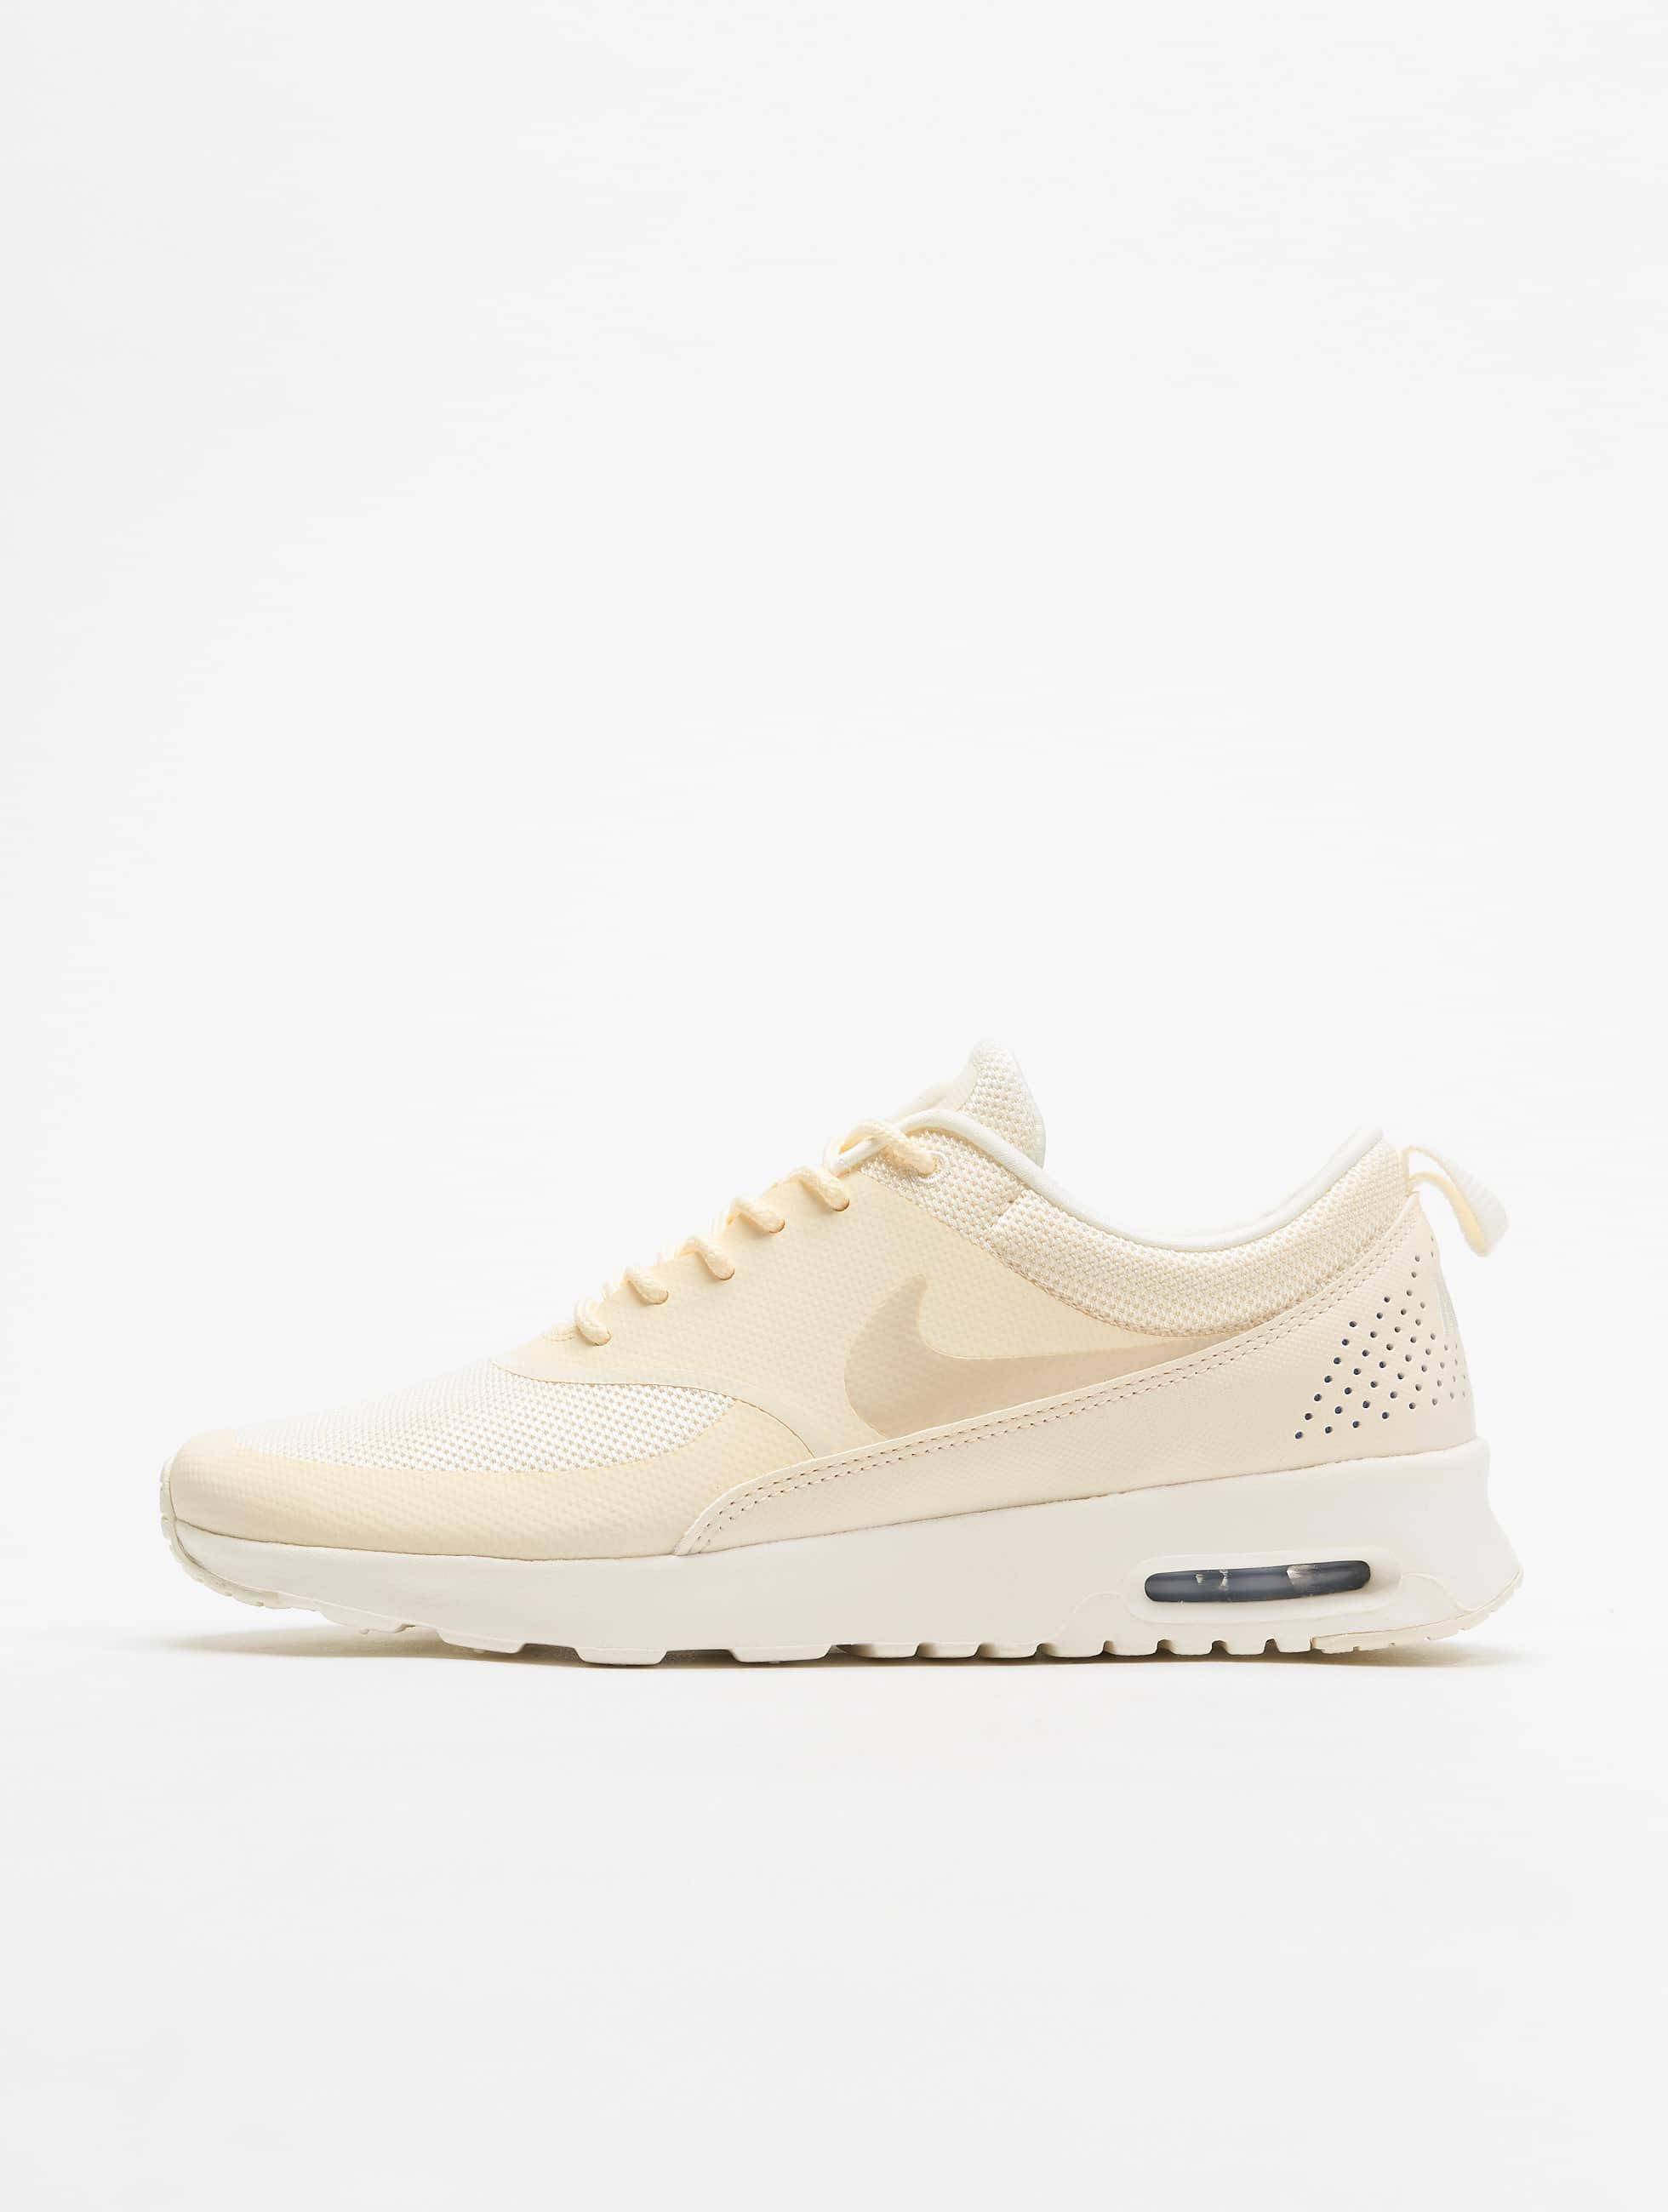 innovative design ebe06 492e6 Nike   Air Max Thea beige Femme Baskets 581521